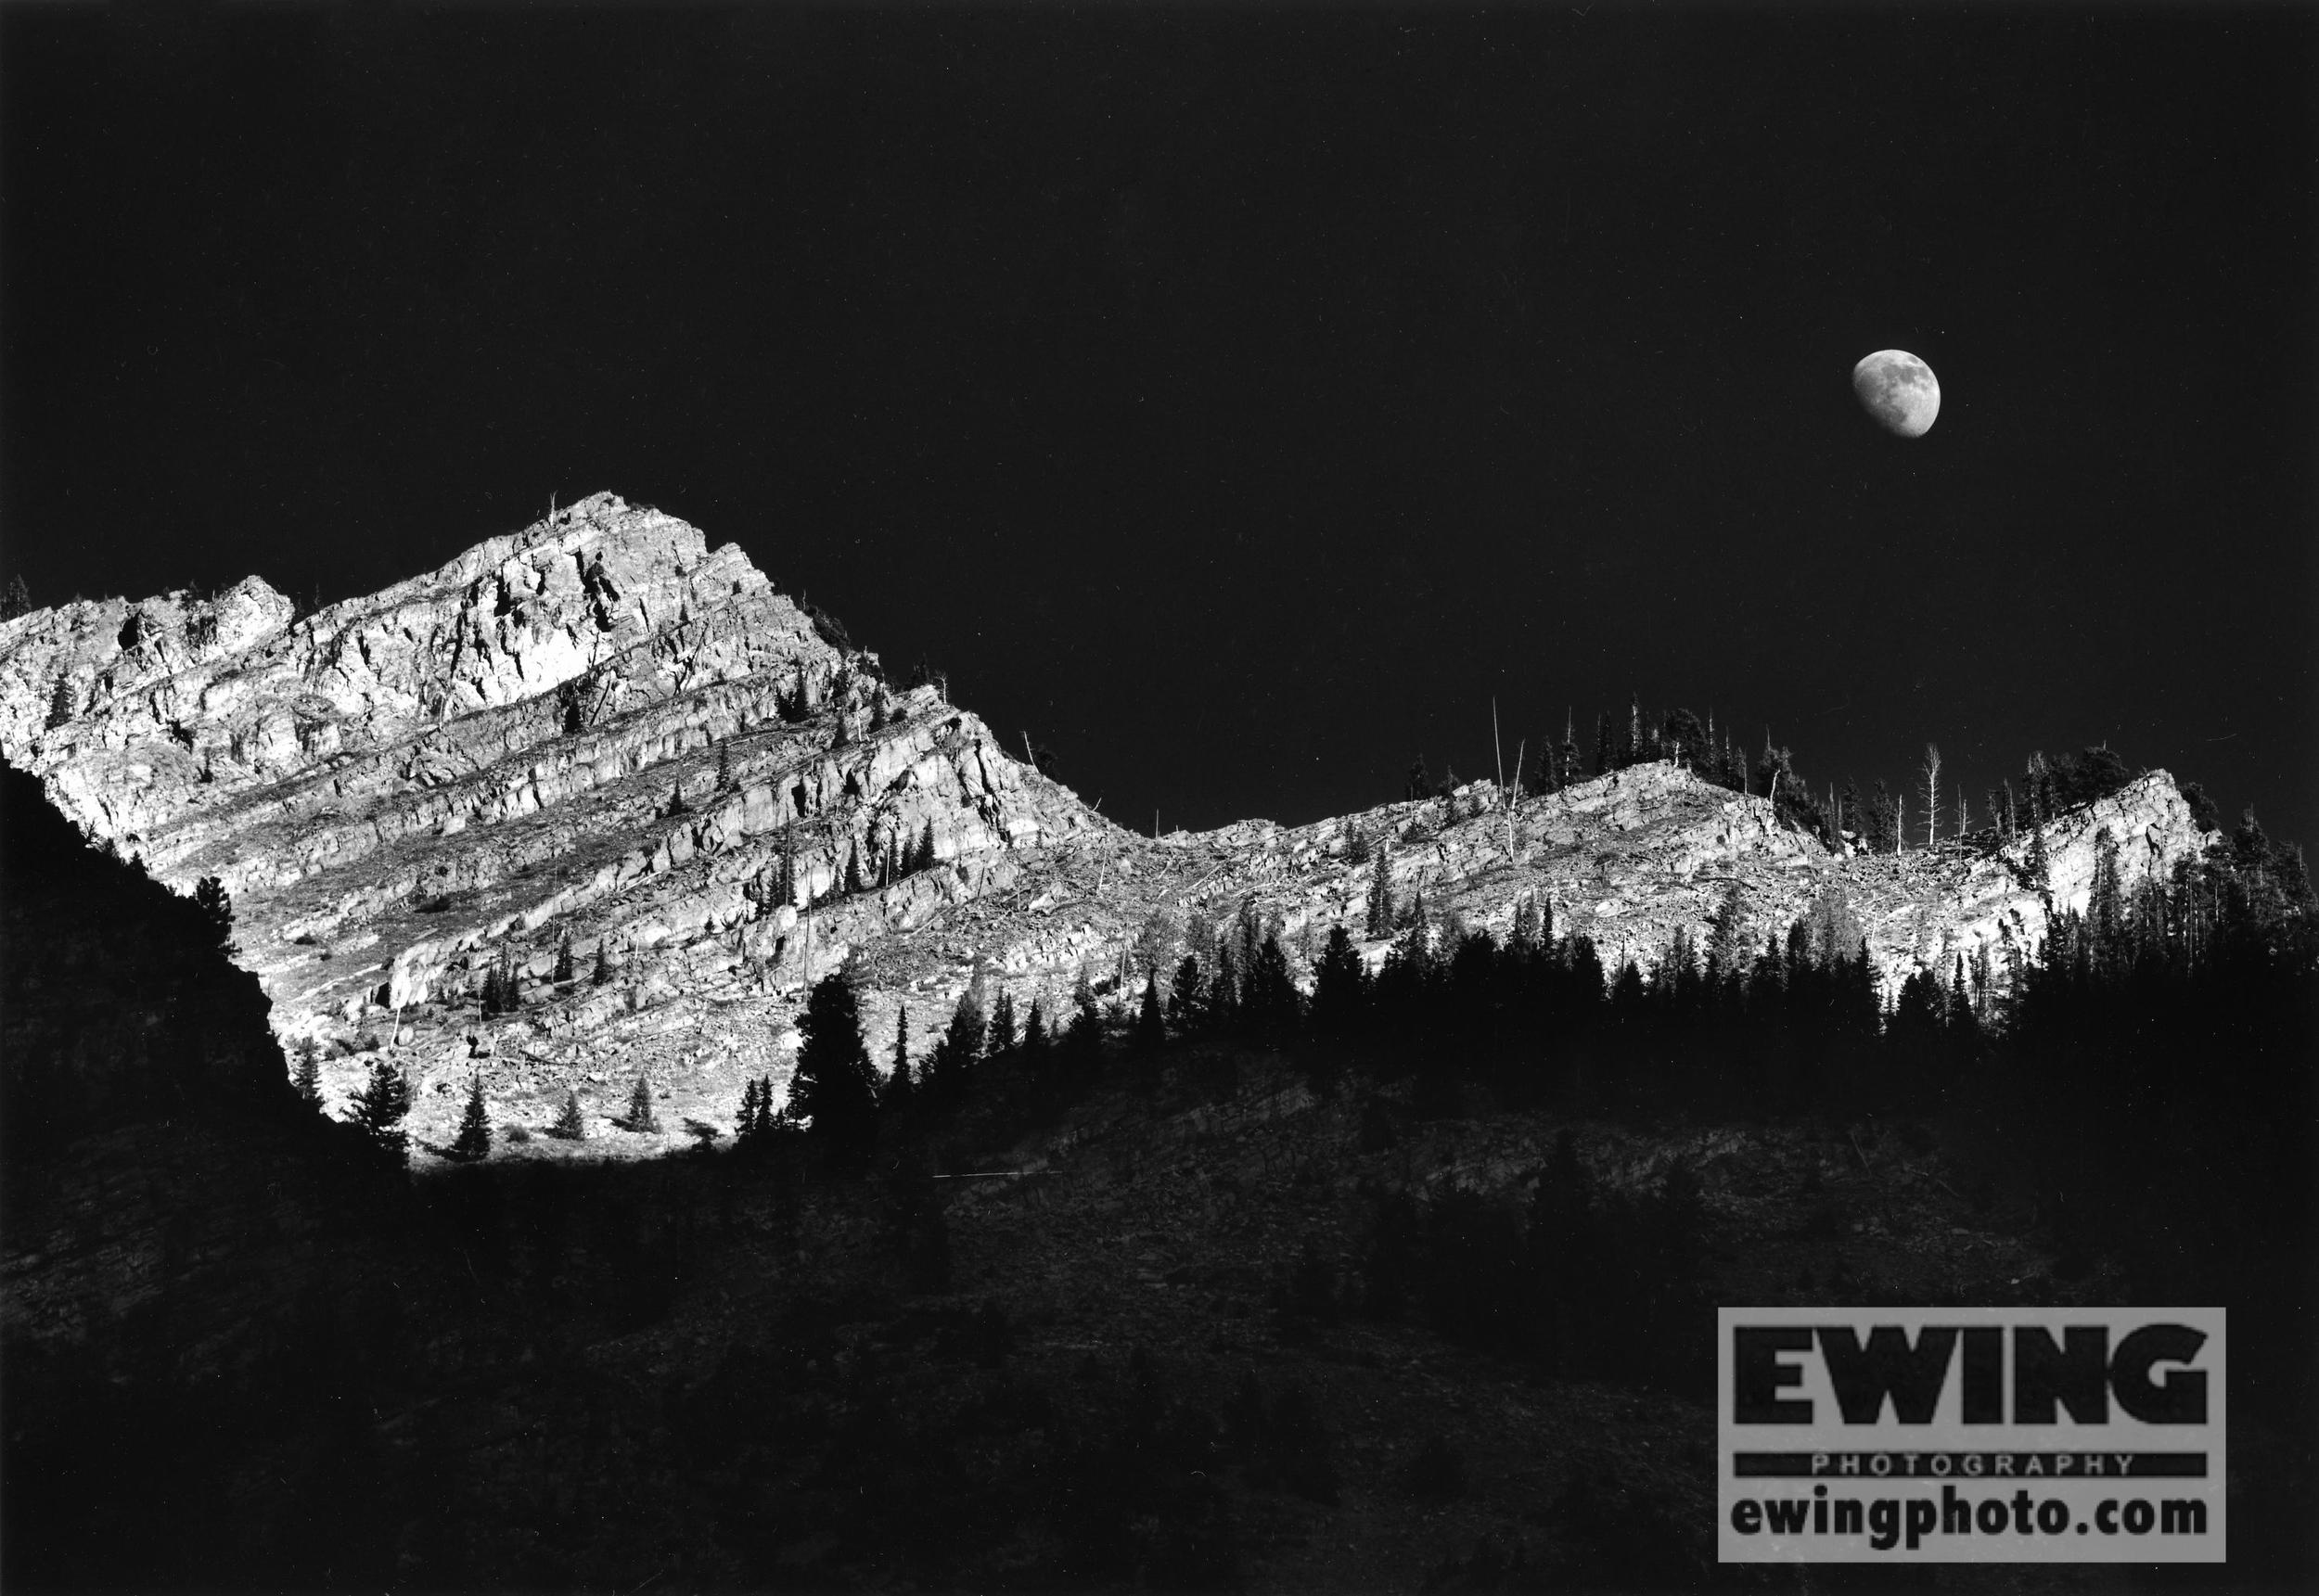 Highland Peak, Snowmass Wilderness, Colorado